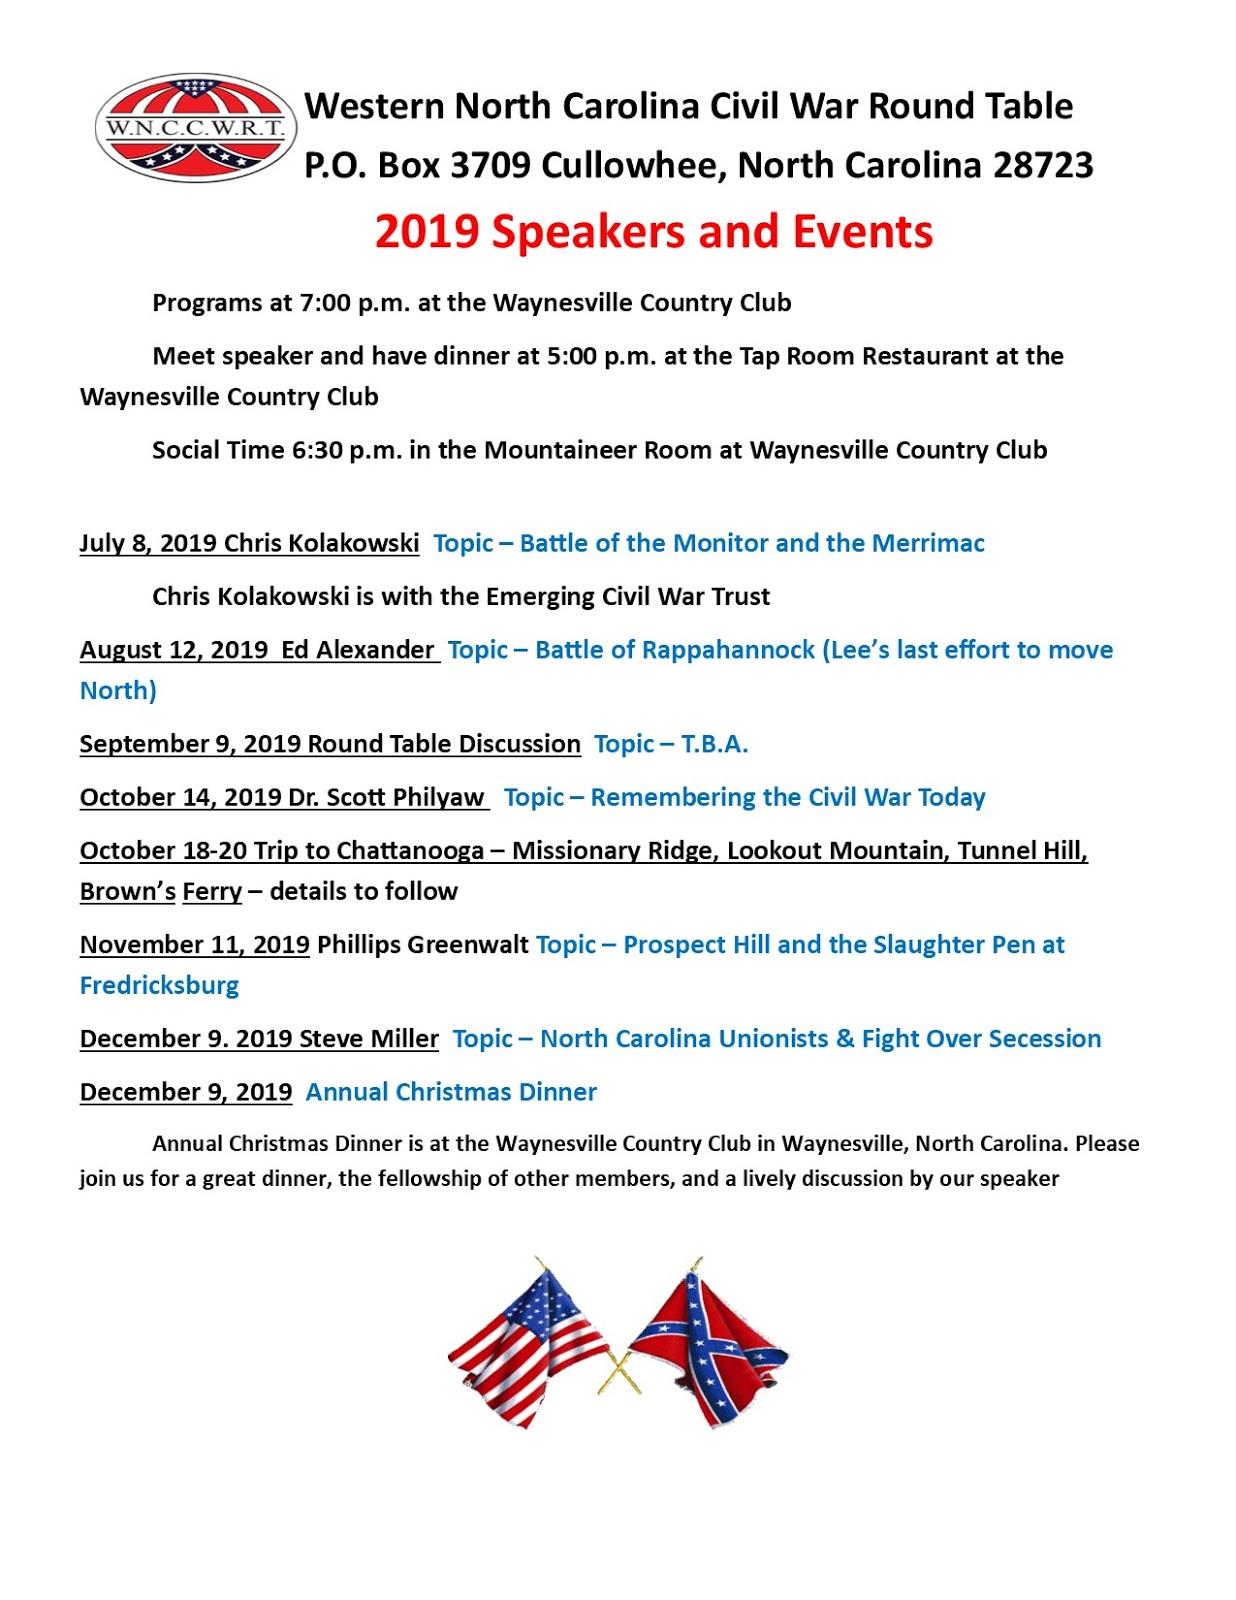 Western North Carolina Civil War Round Table: WNCCWRT 2019